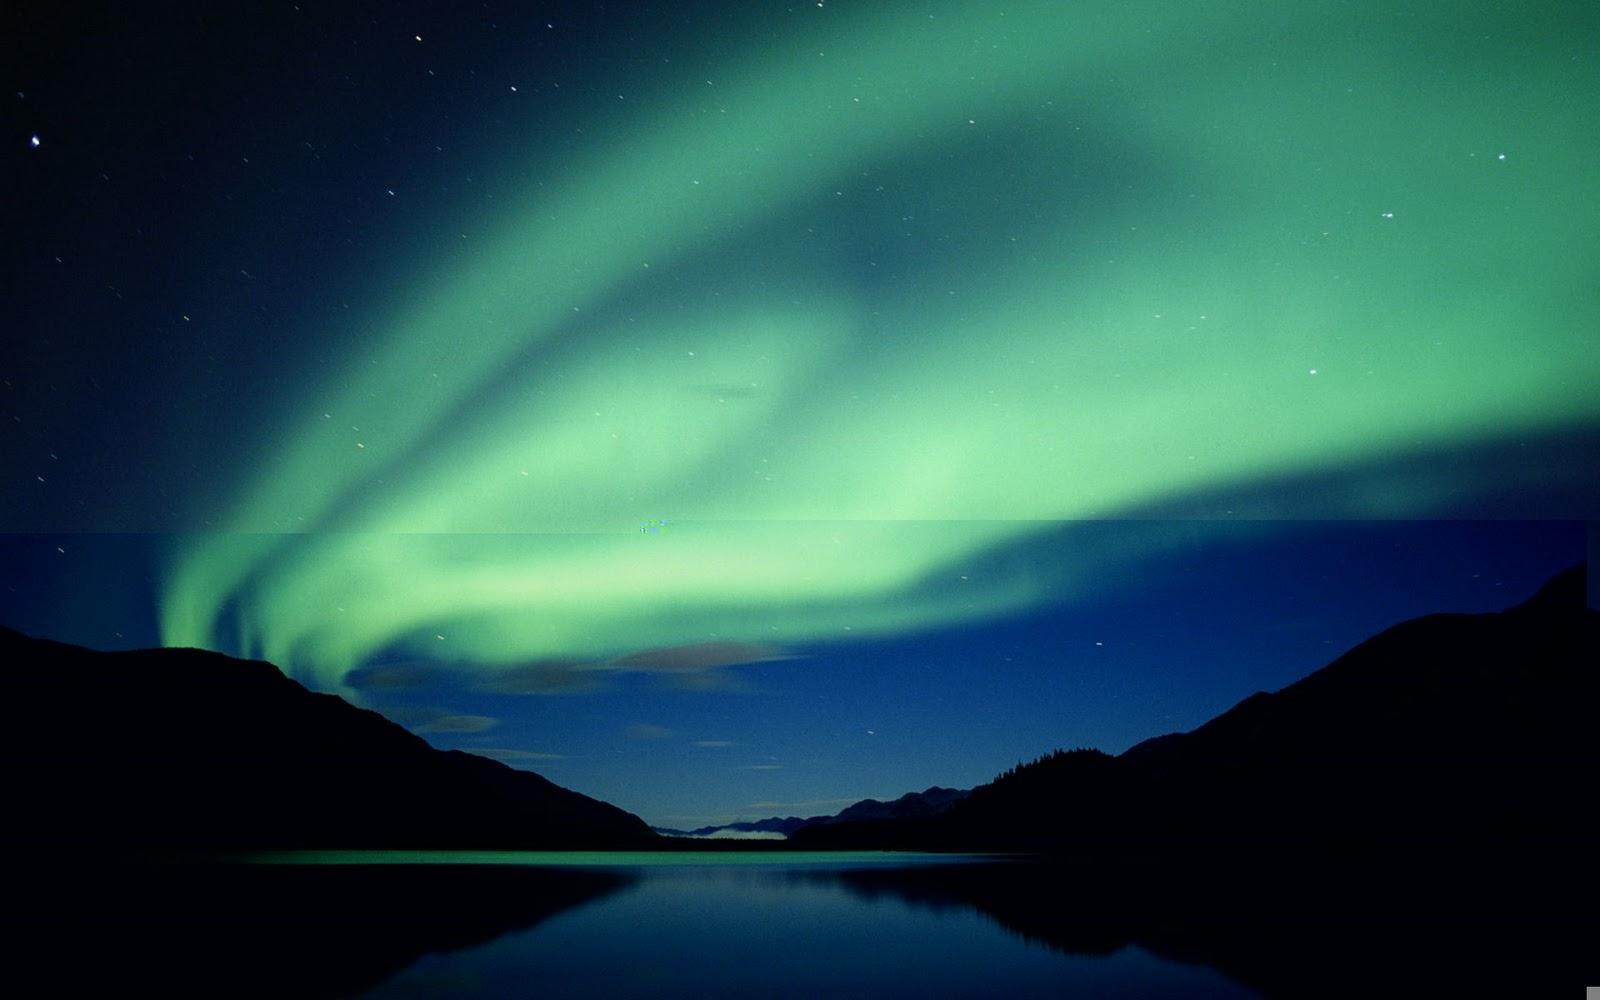 Aurora Borealis - Northern Lights PicturesNorthern Lights